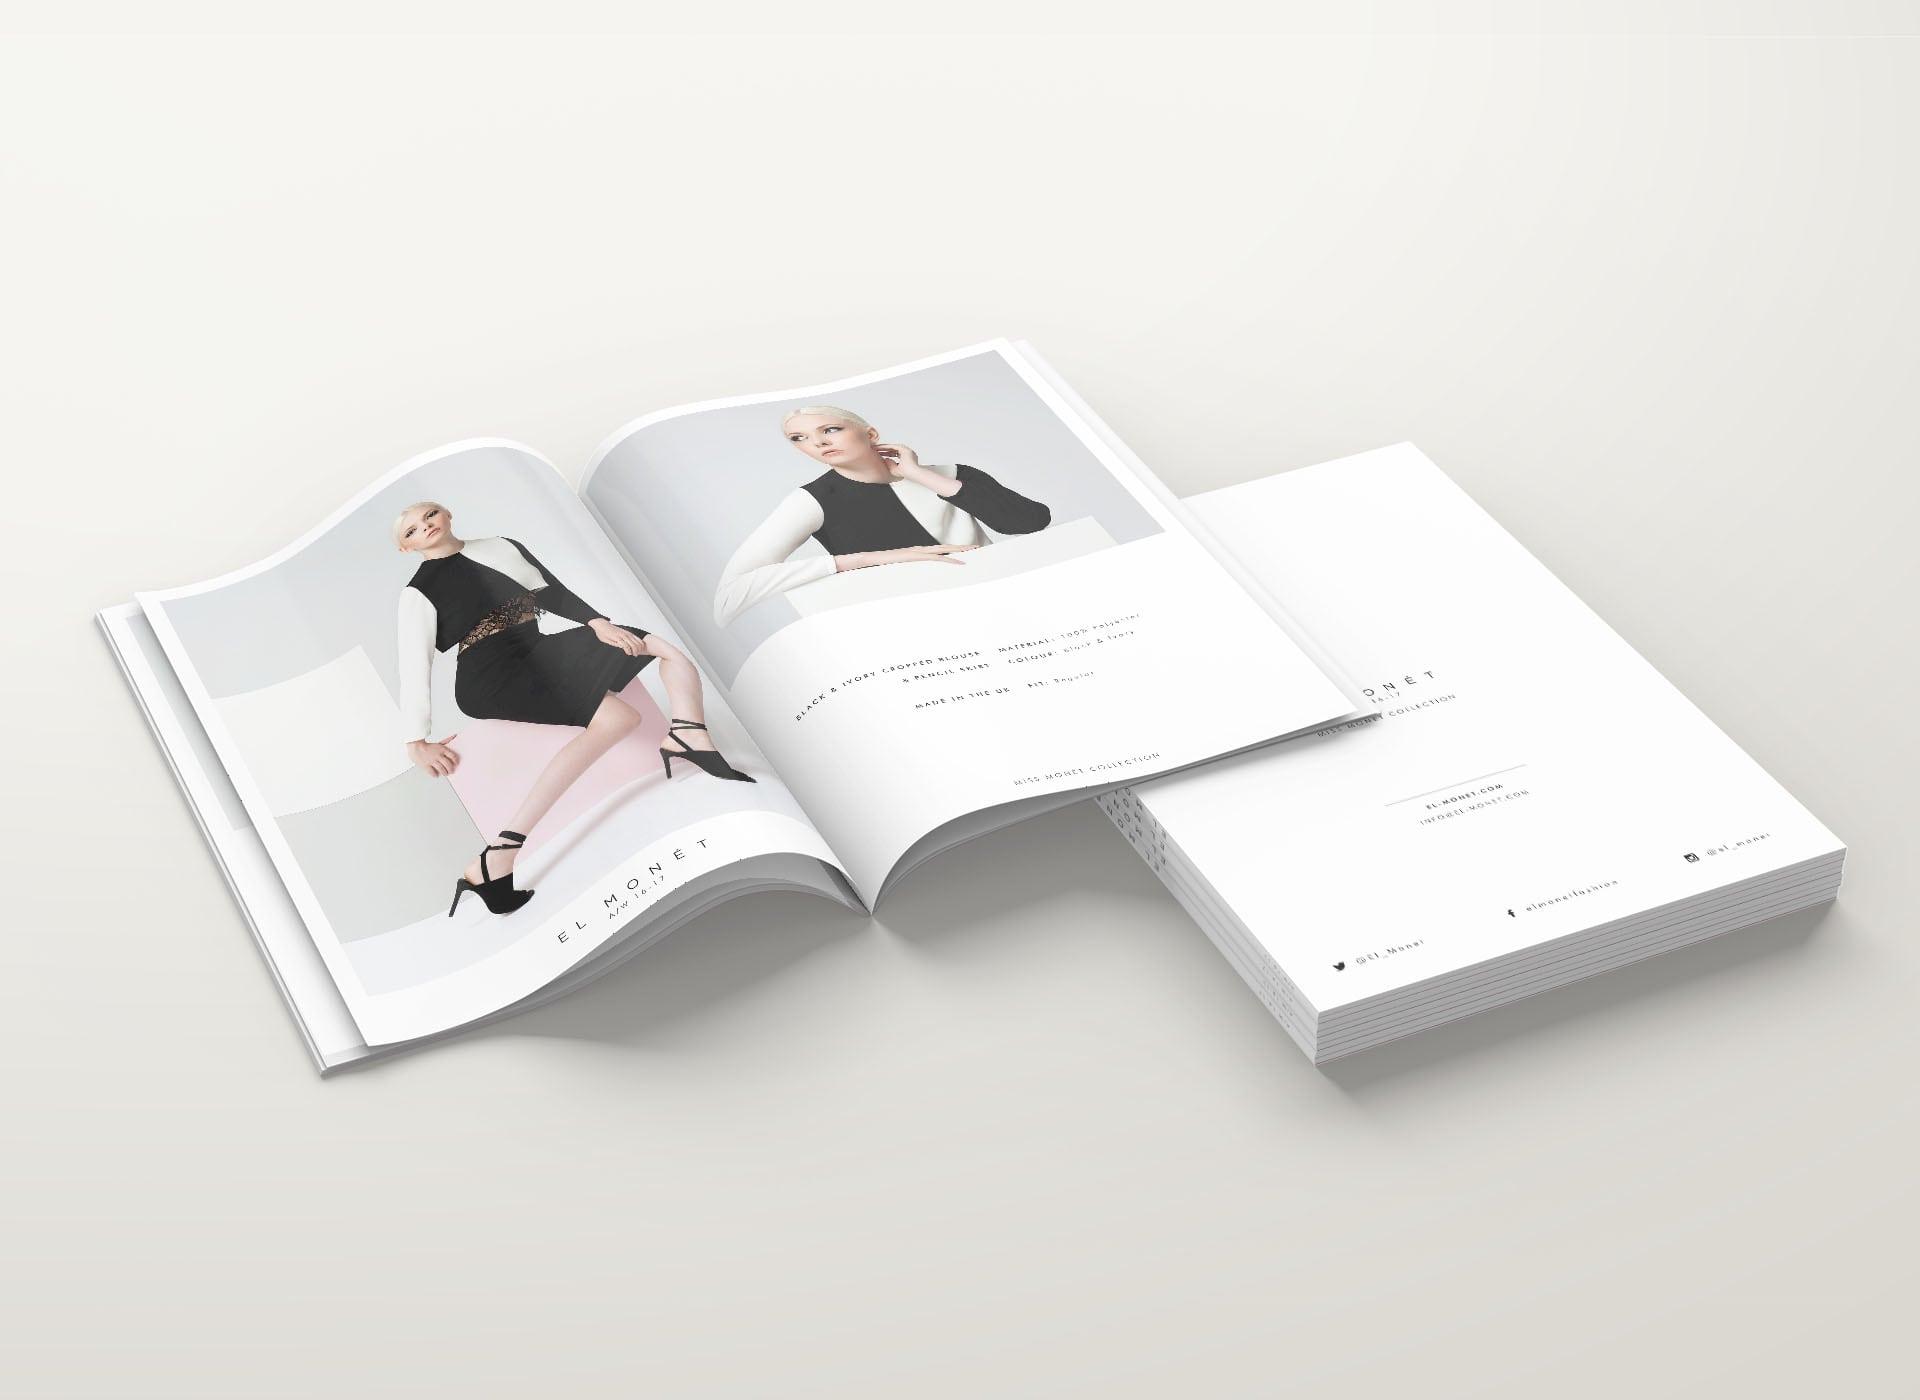 saint loupe, digital agency birmingham, creative studio uk, content production, web agency, marketing agency birmingham, brochure design and printing, marketing print, print services birmingham